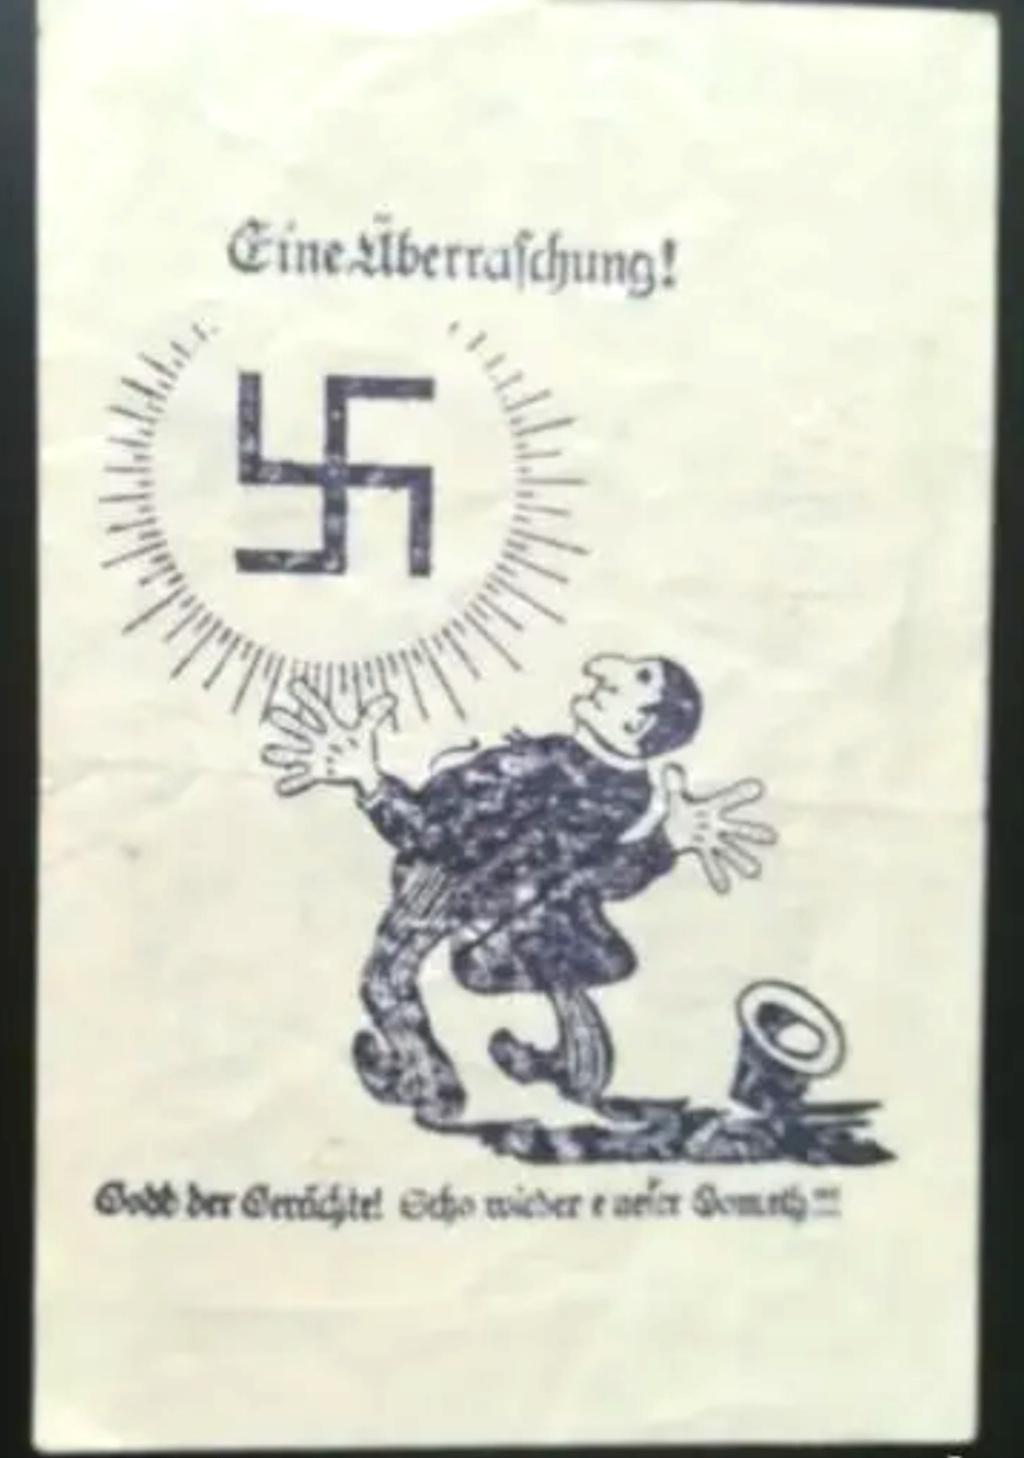 Eine Million Mark 1923 con una sobreimpresión de propaganda virulenta. Img_2063